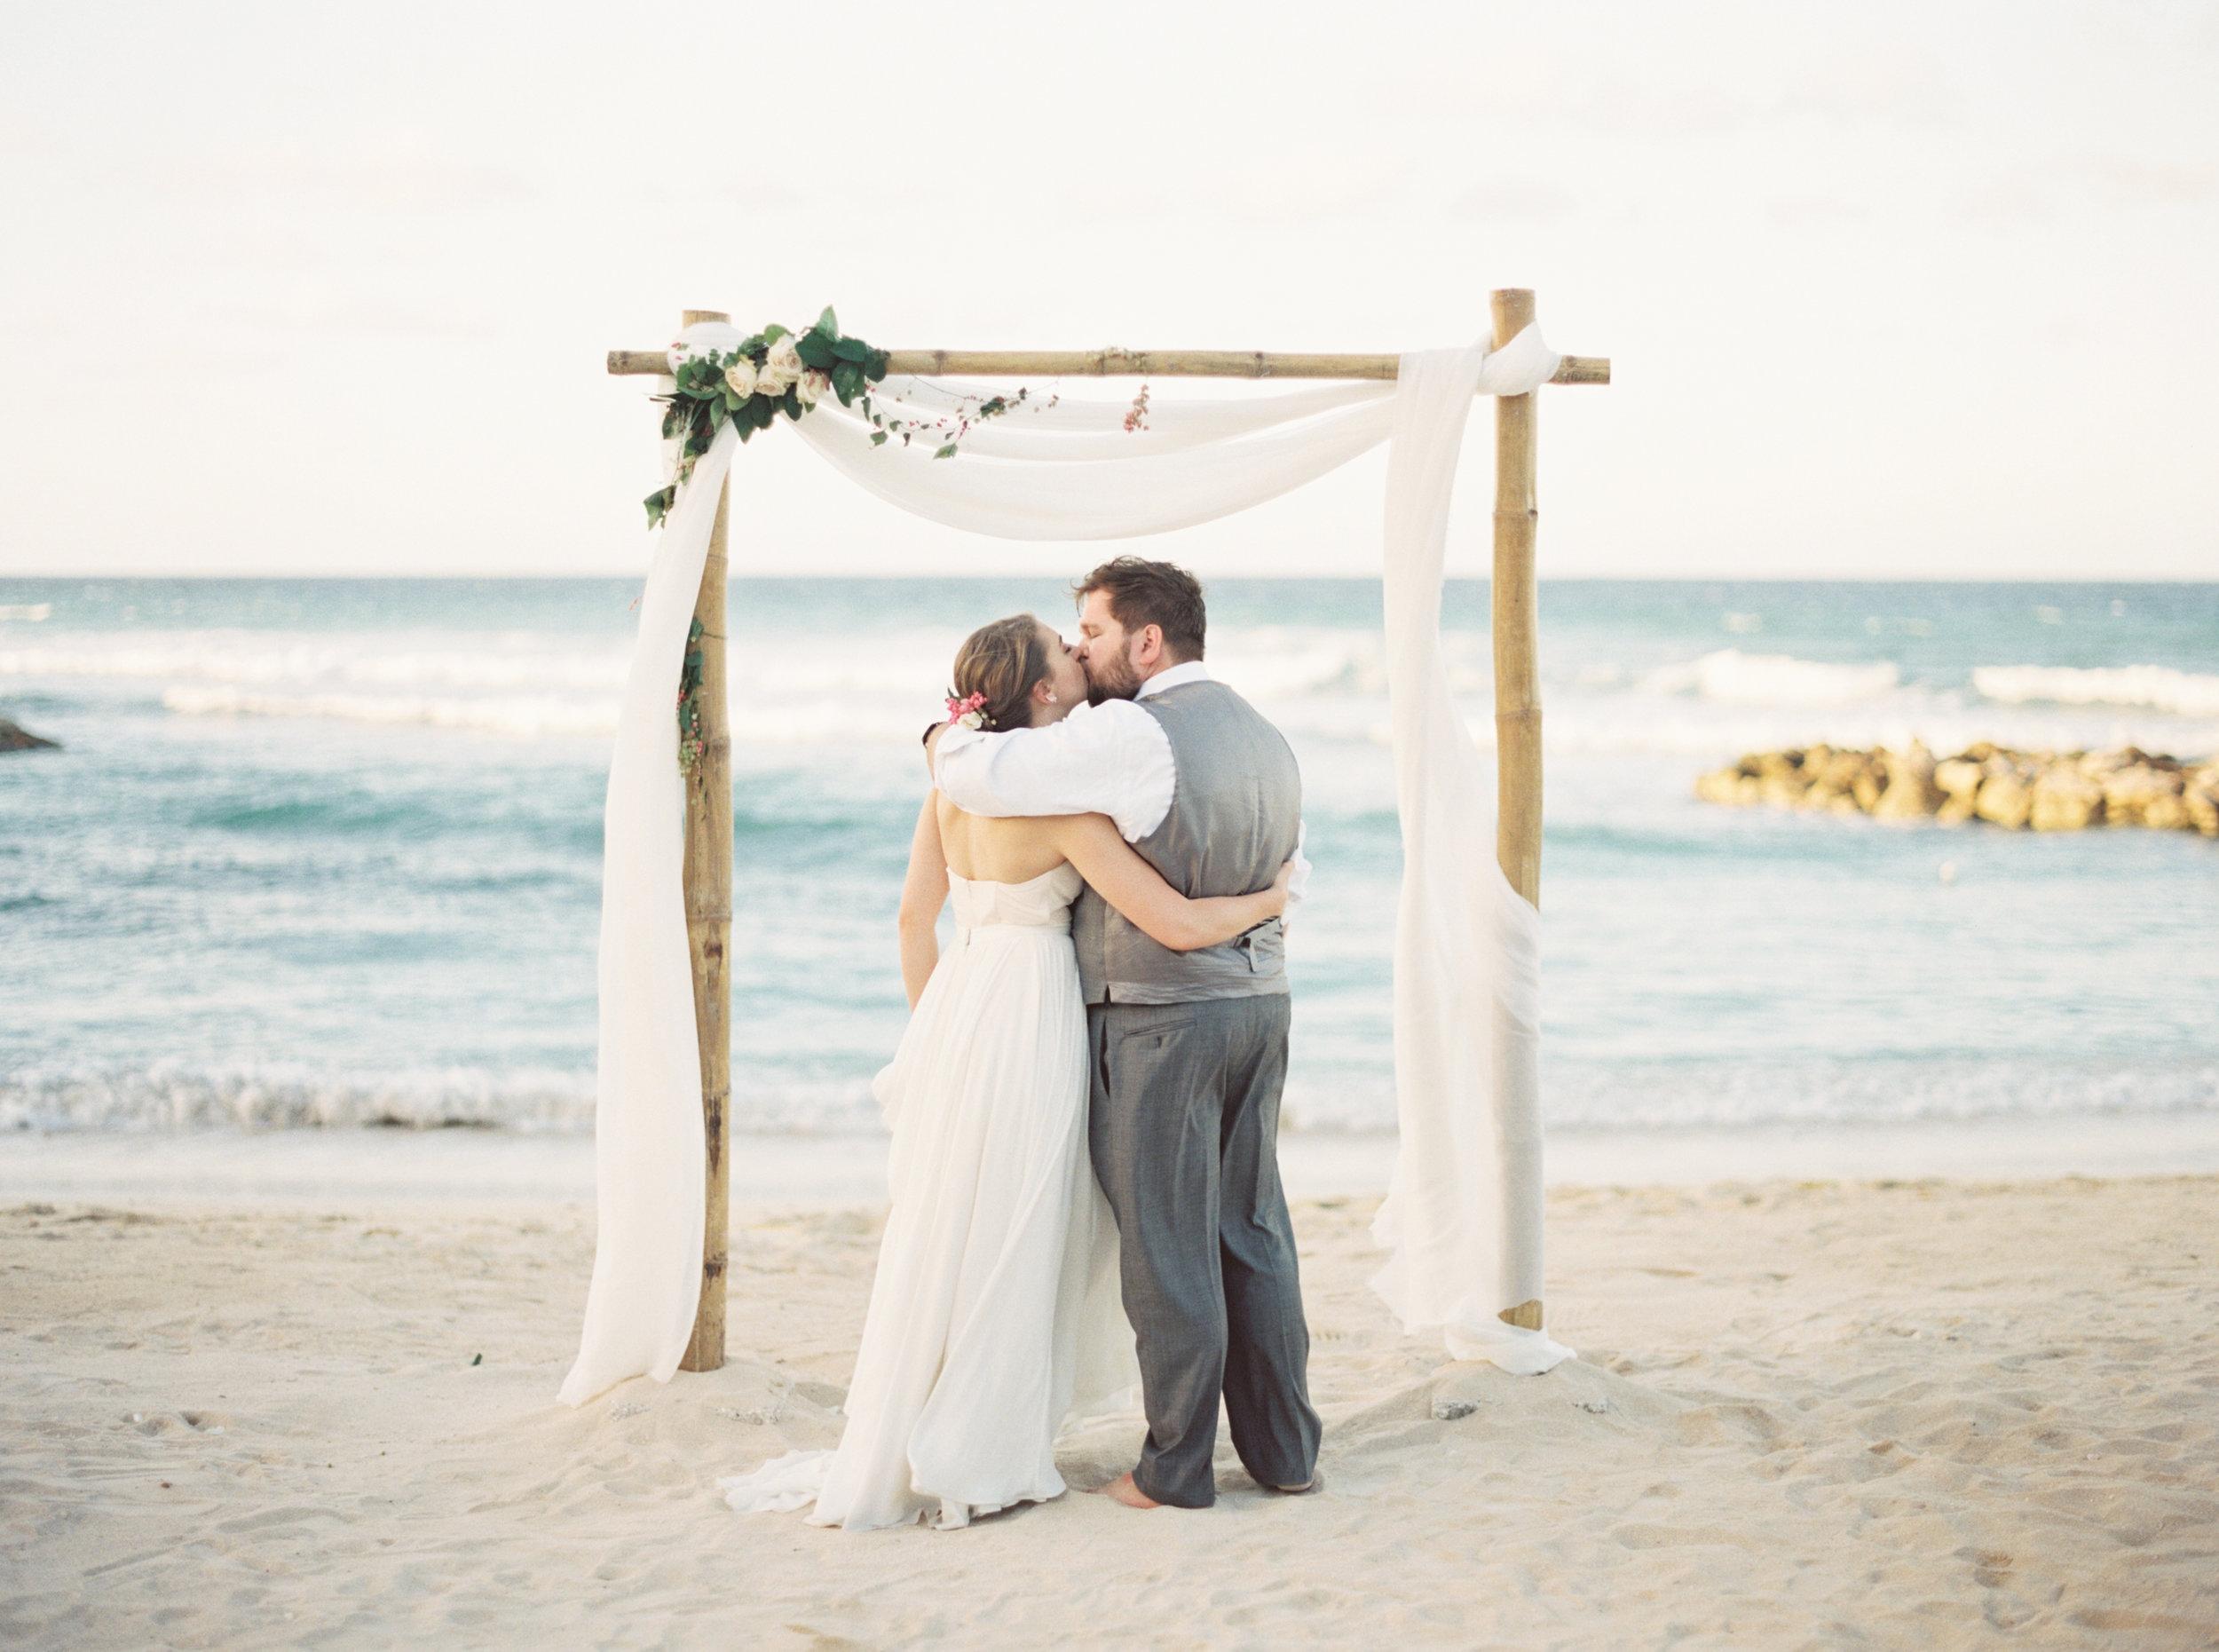 Jamaica destination wedding by Dallas destination wedding photographer Tracy Enoch